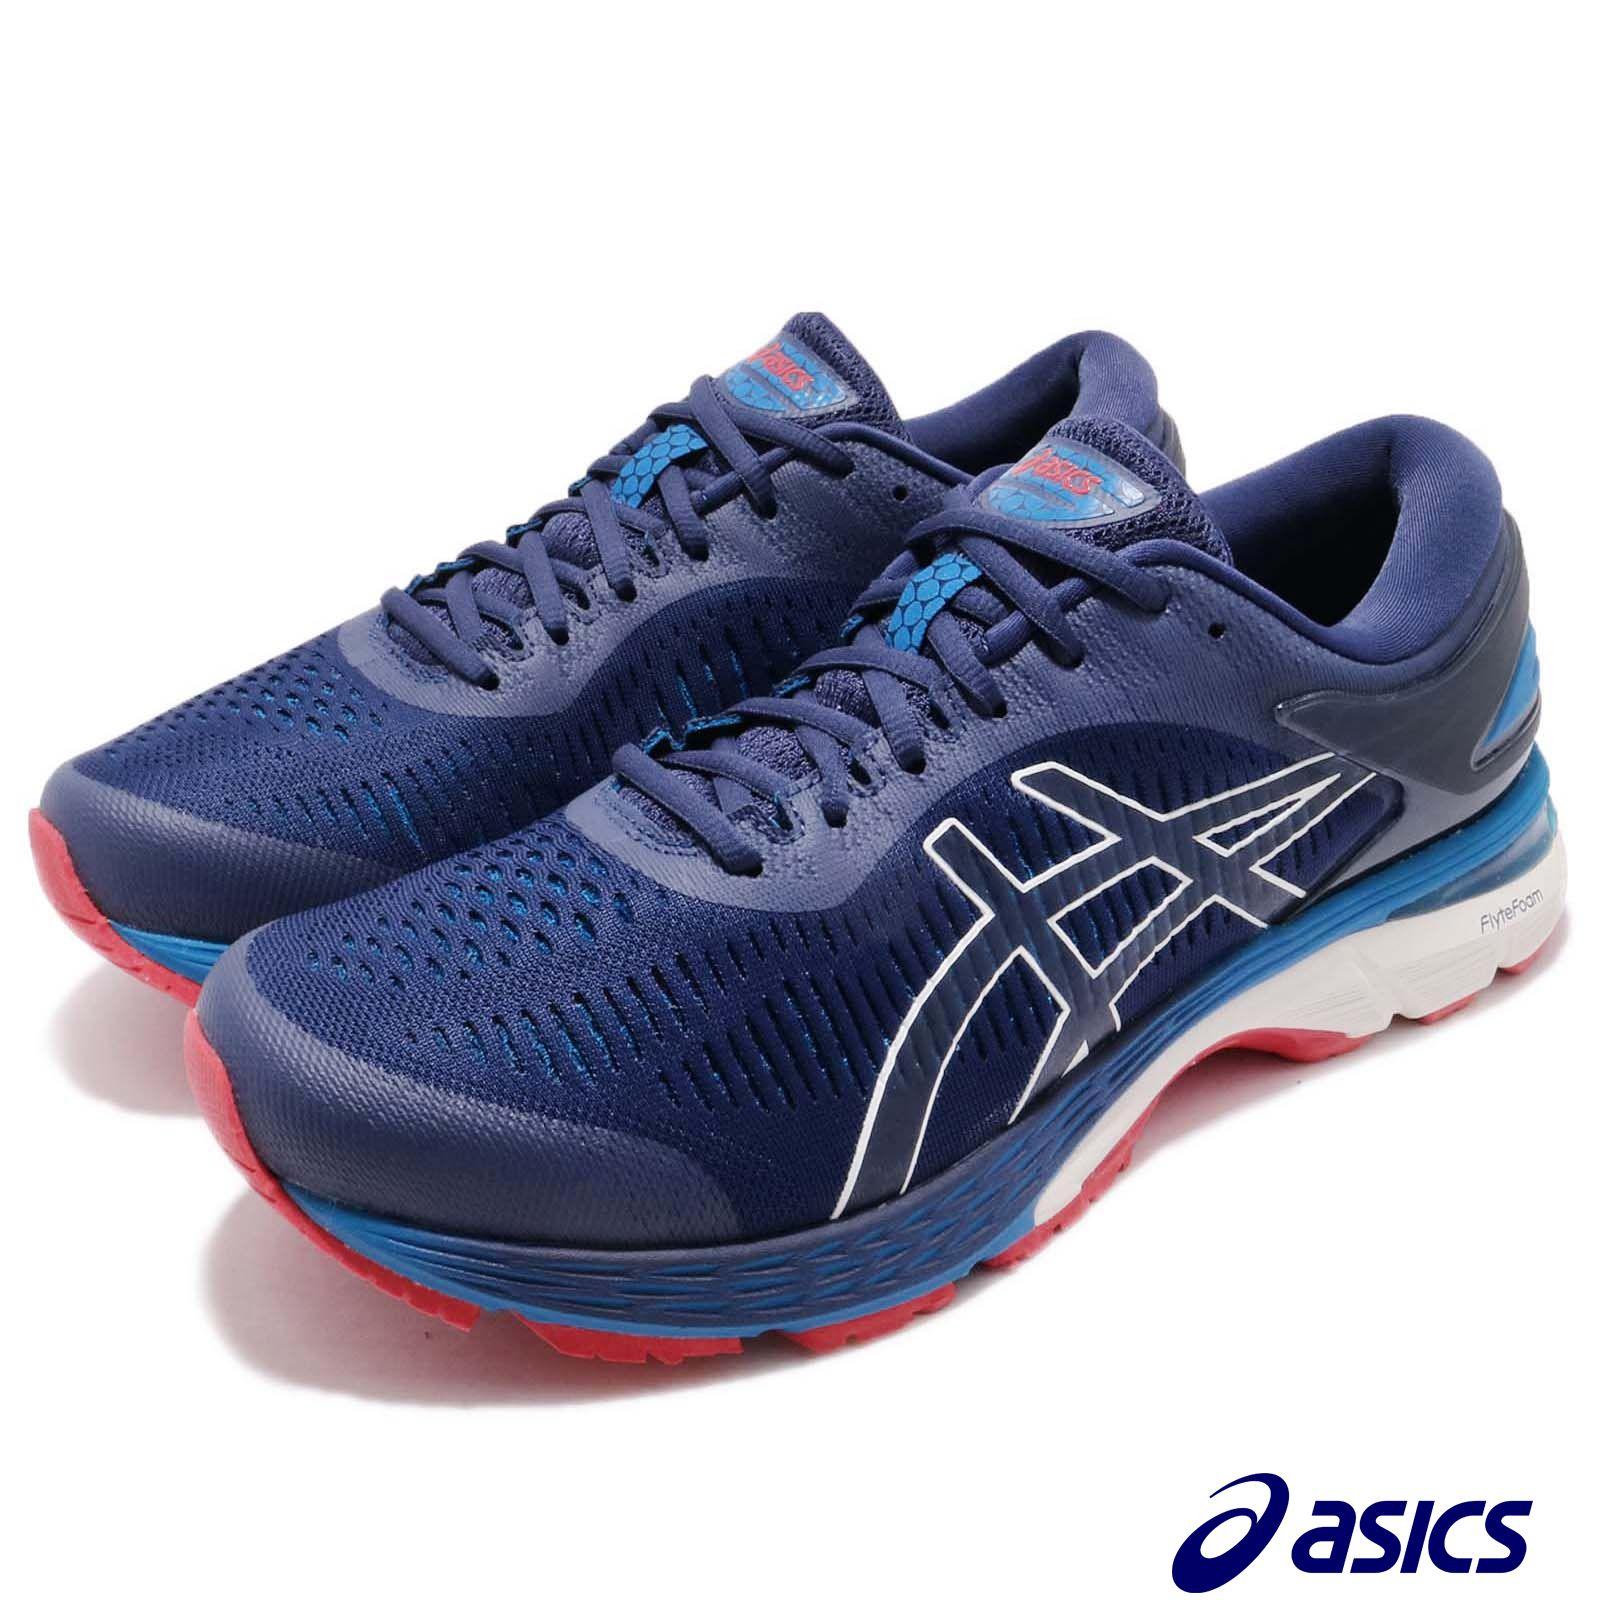 Asics 慢跑鞋 Gel-Kayano 25 4E 男鞋 1011A023400